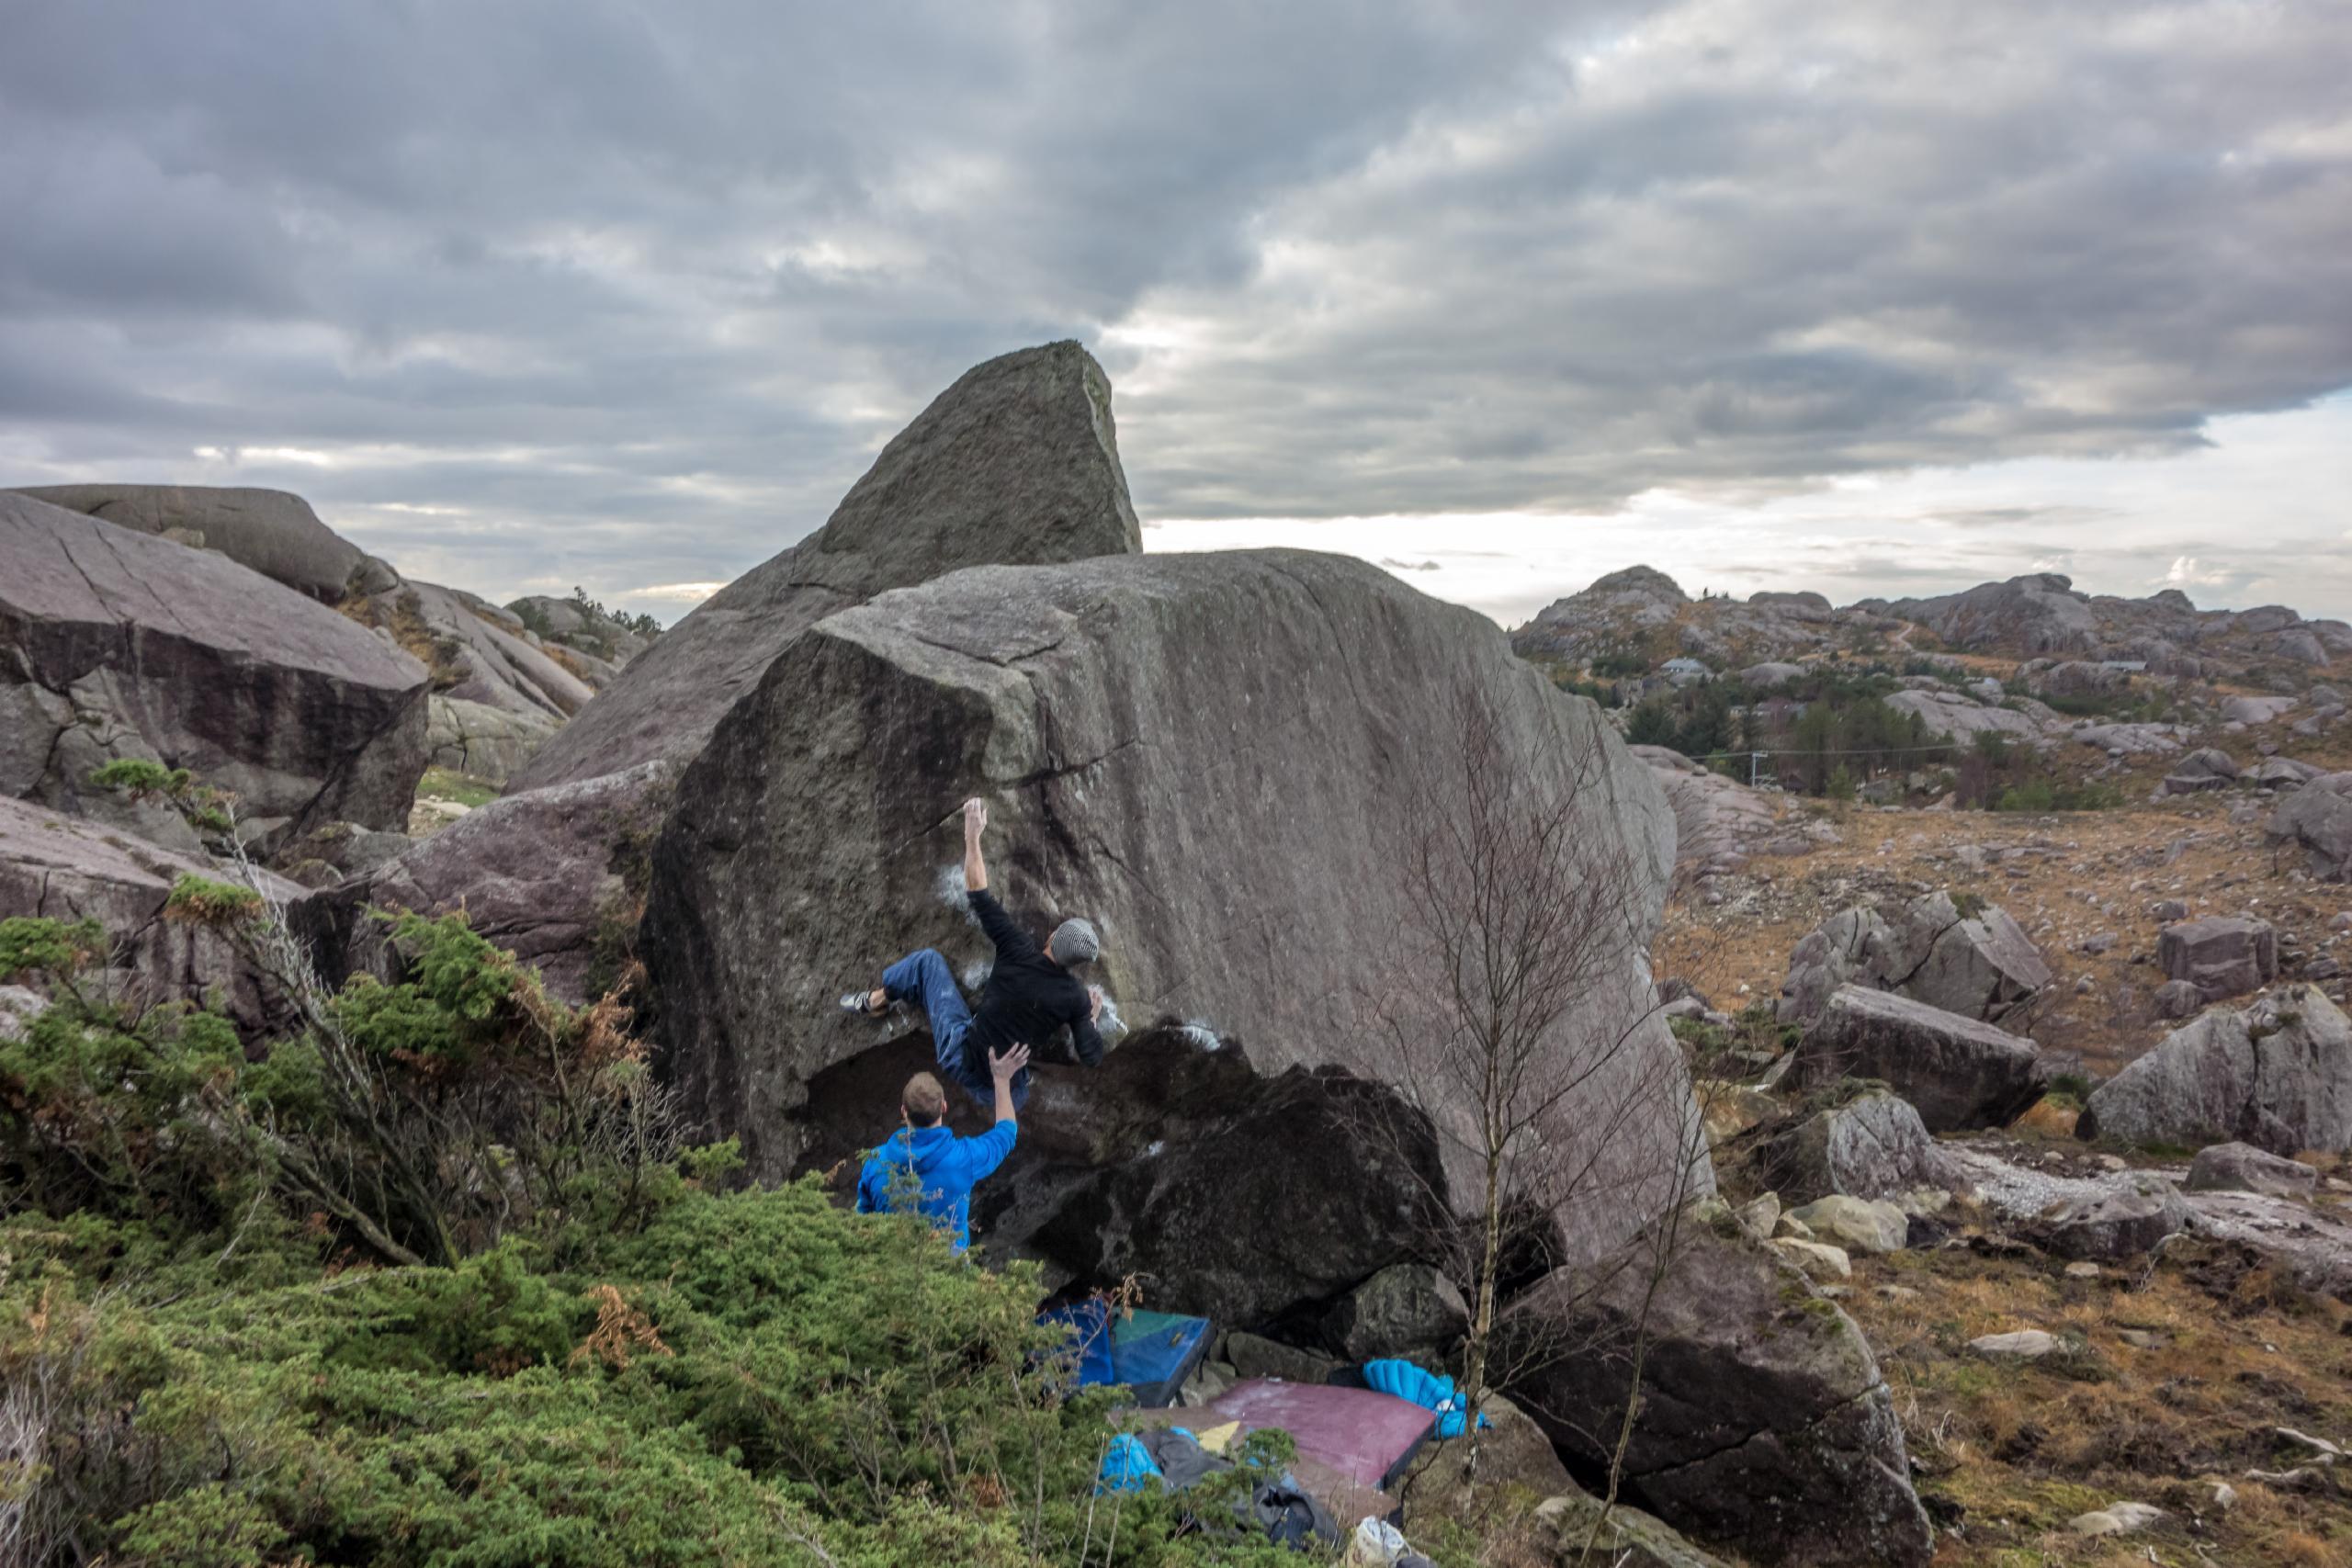 photographer: Jostein Øygarden, in photo: Tore Årthun